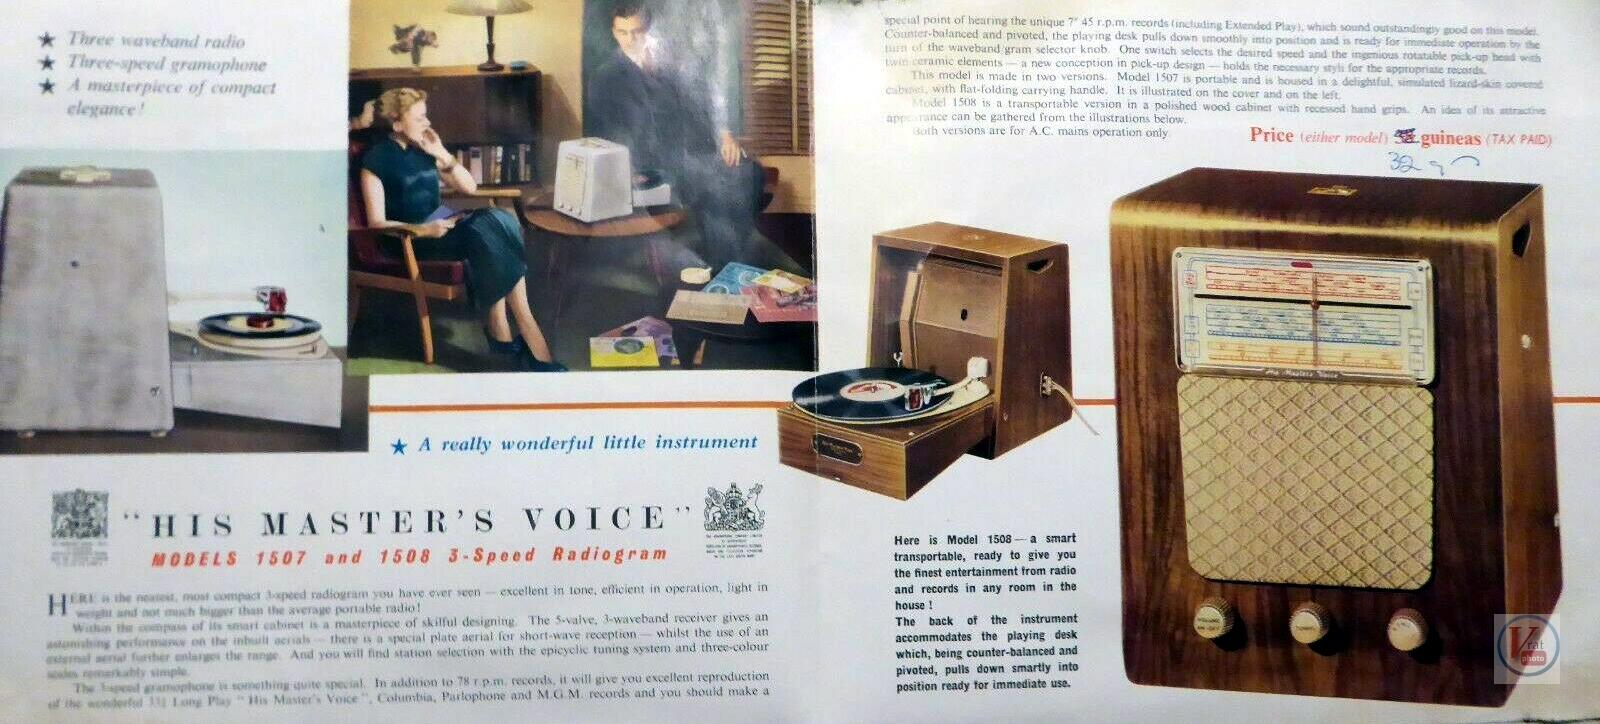 HMV Radios 3